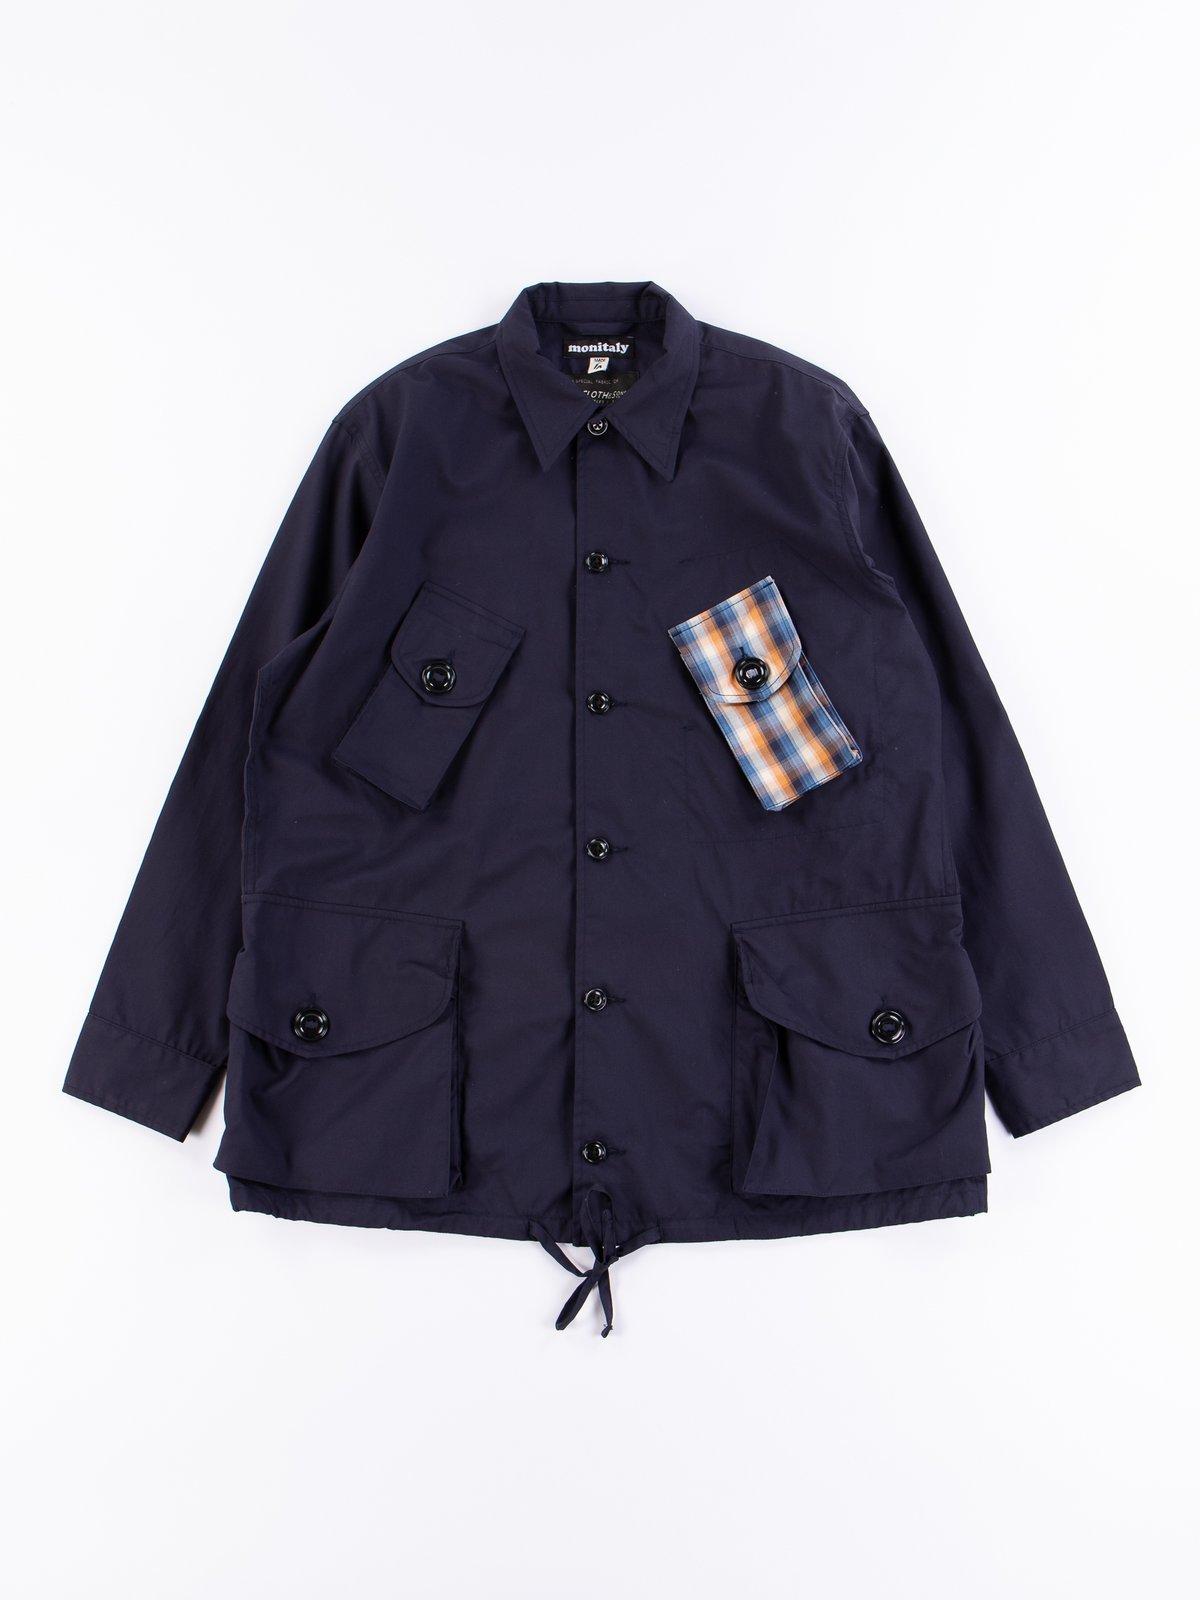 Navy Vancloth Oxford Military Half Coat Type B Exclusive - Image 1